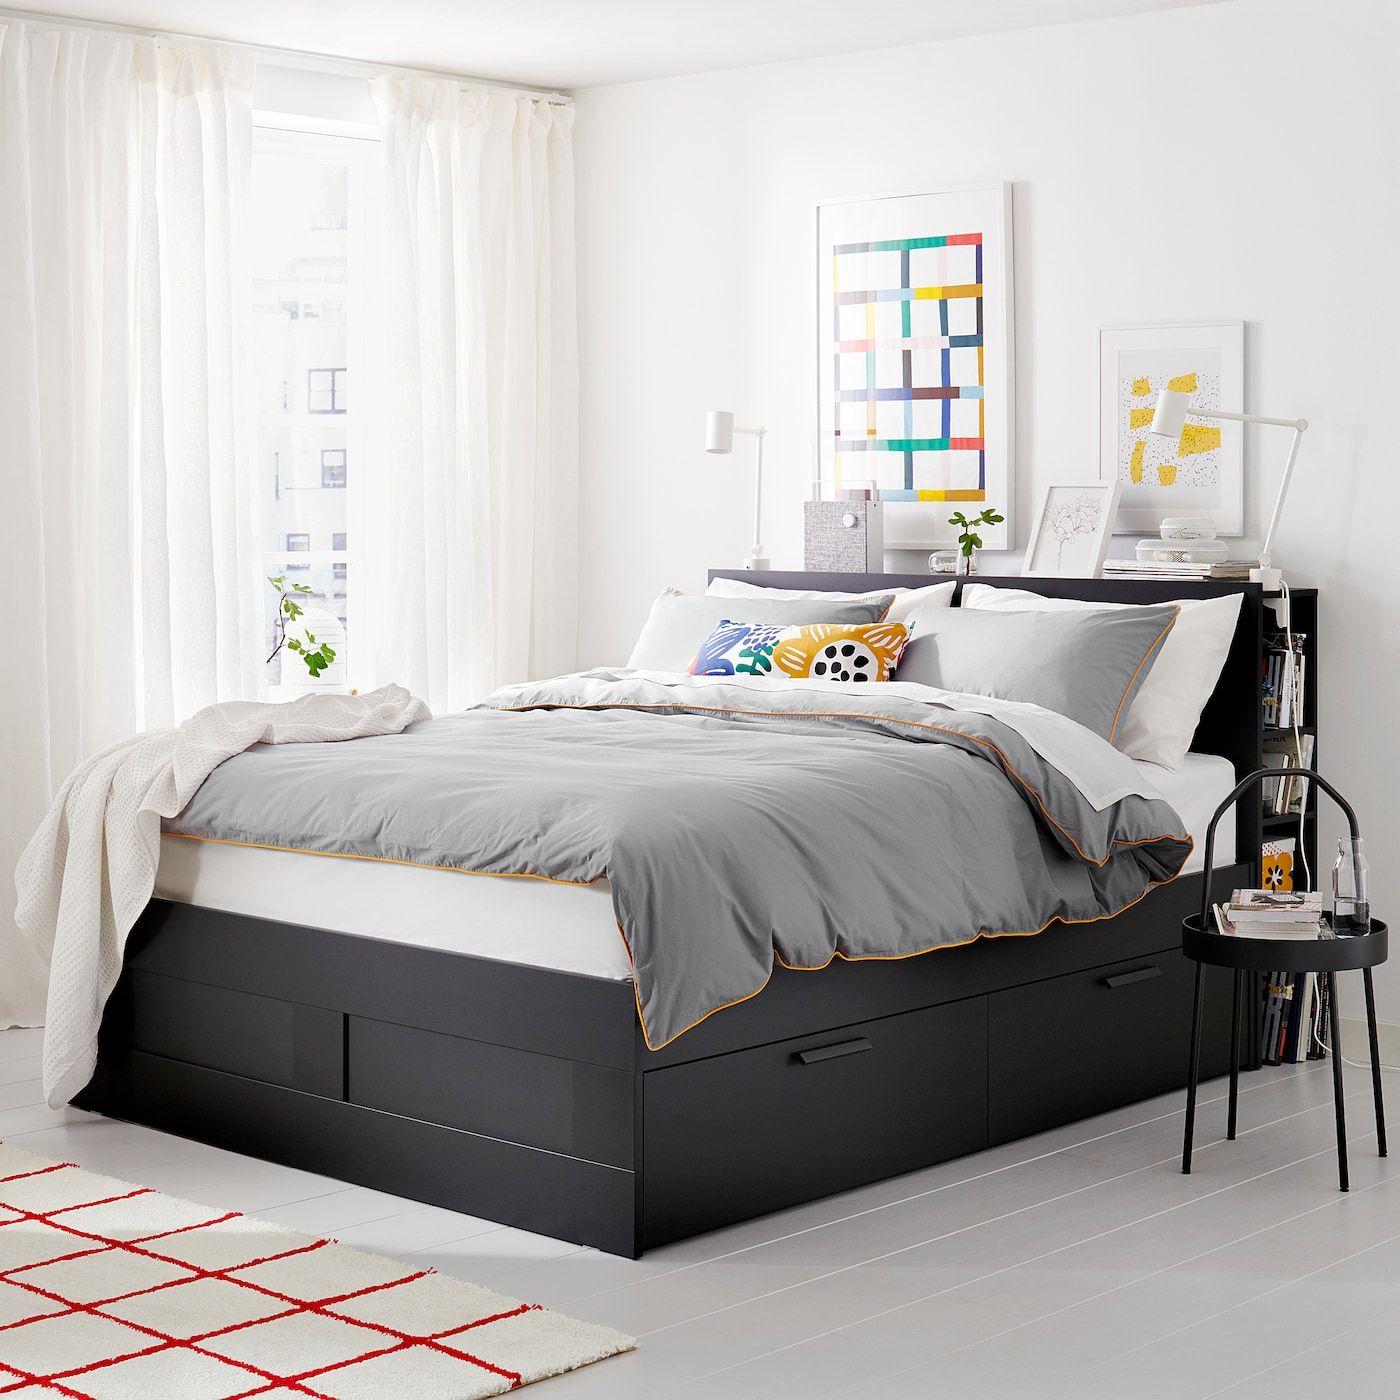 Brimnes Bed Frame With Storage Headboard Black Luroy Full